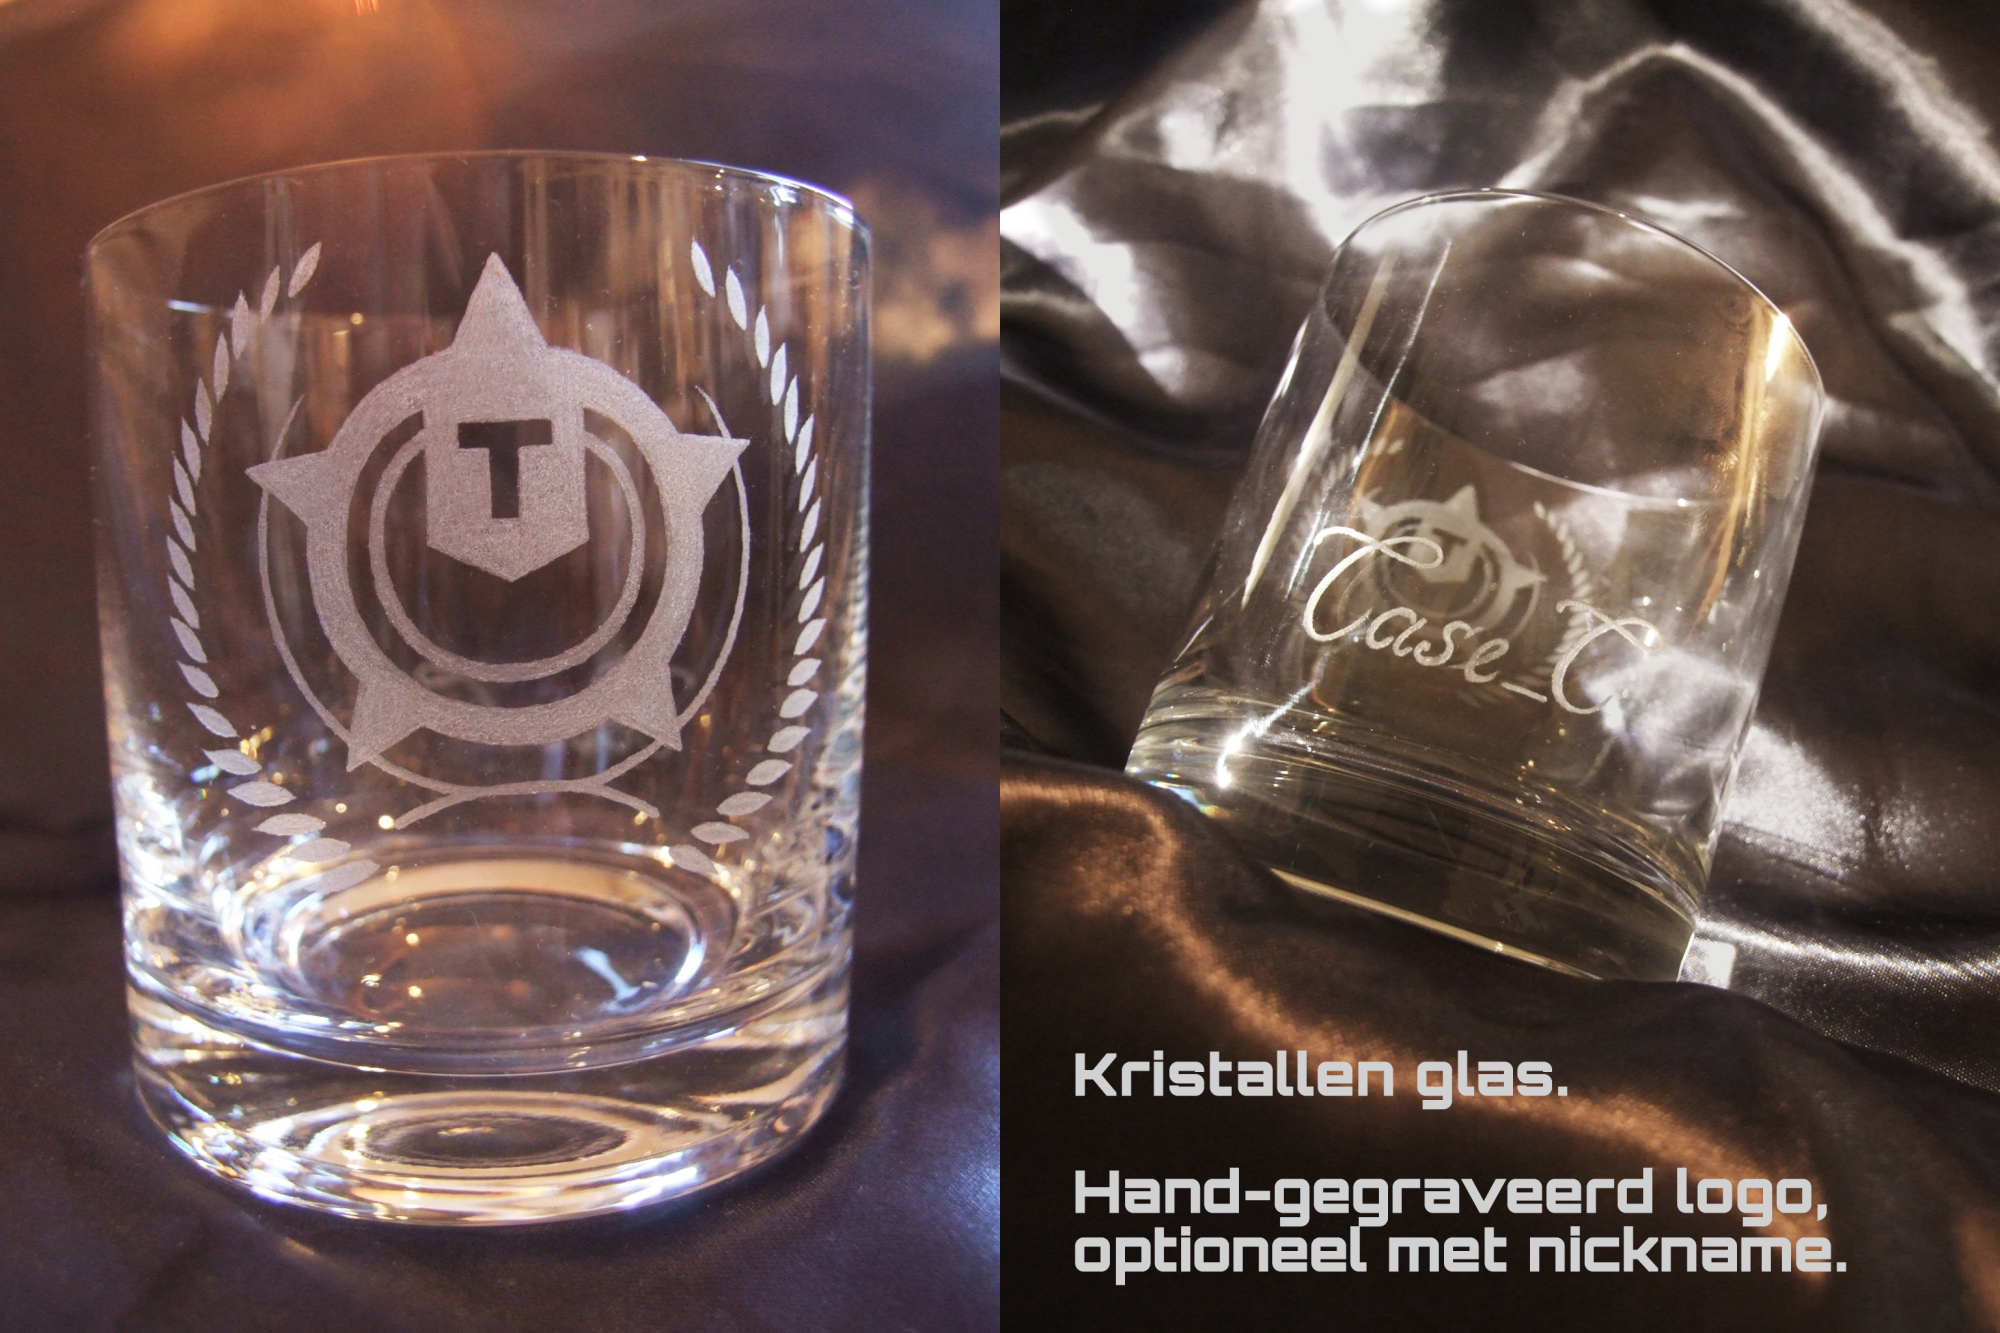 Kristal-glas